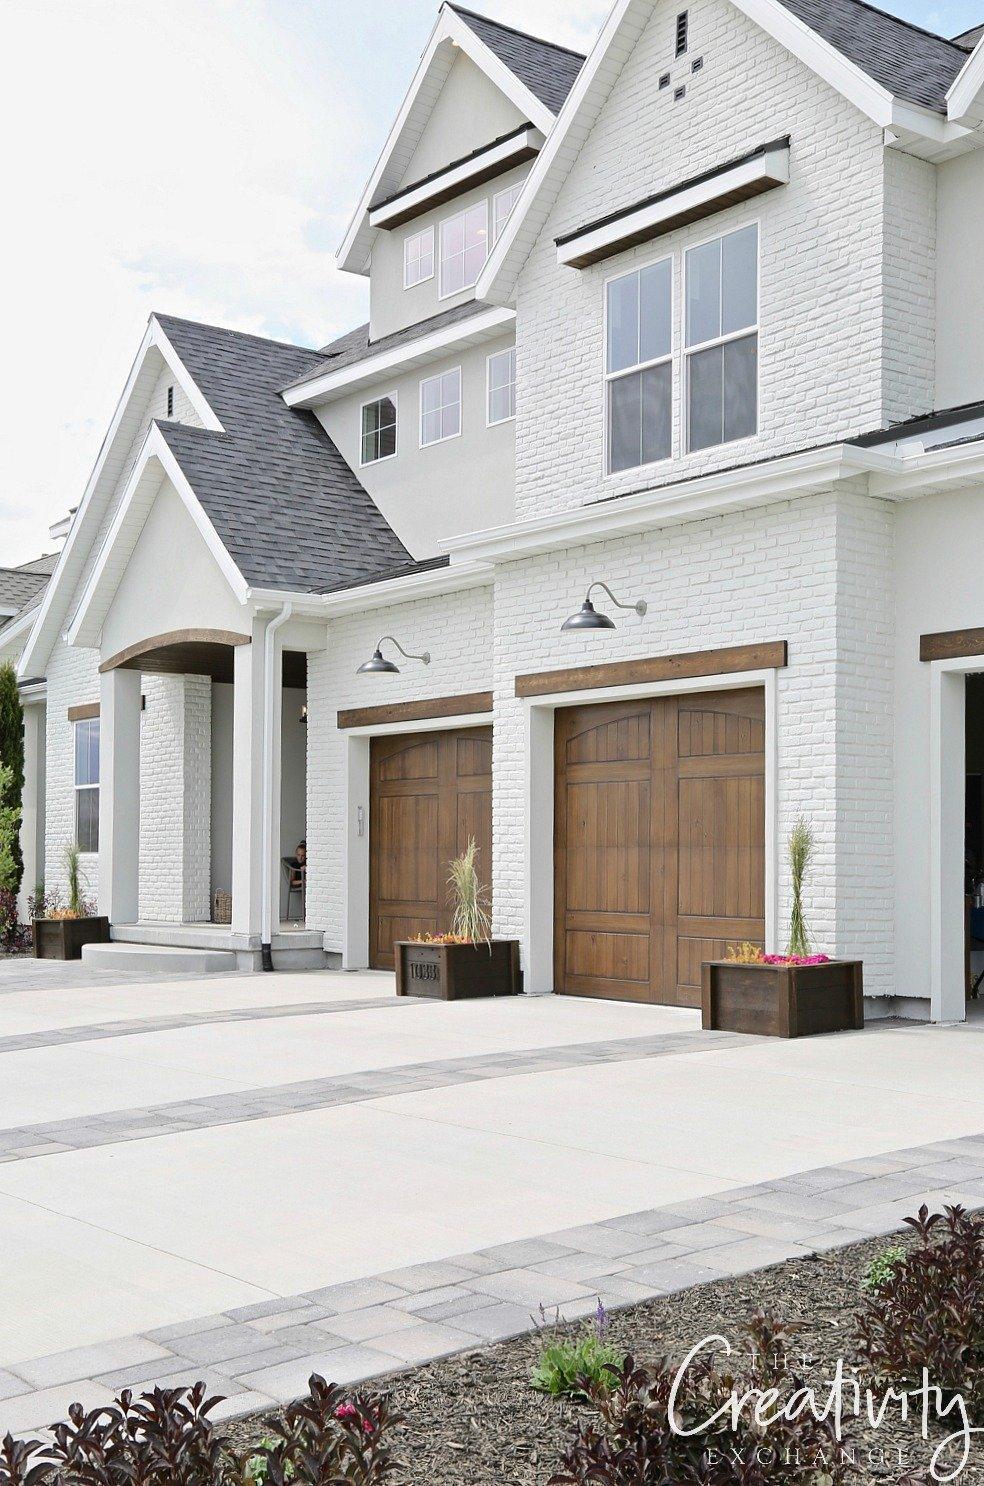 Painted brick exterior with wood garage doors